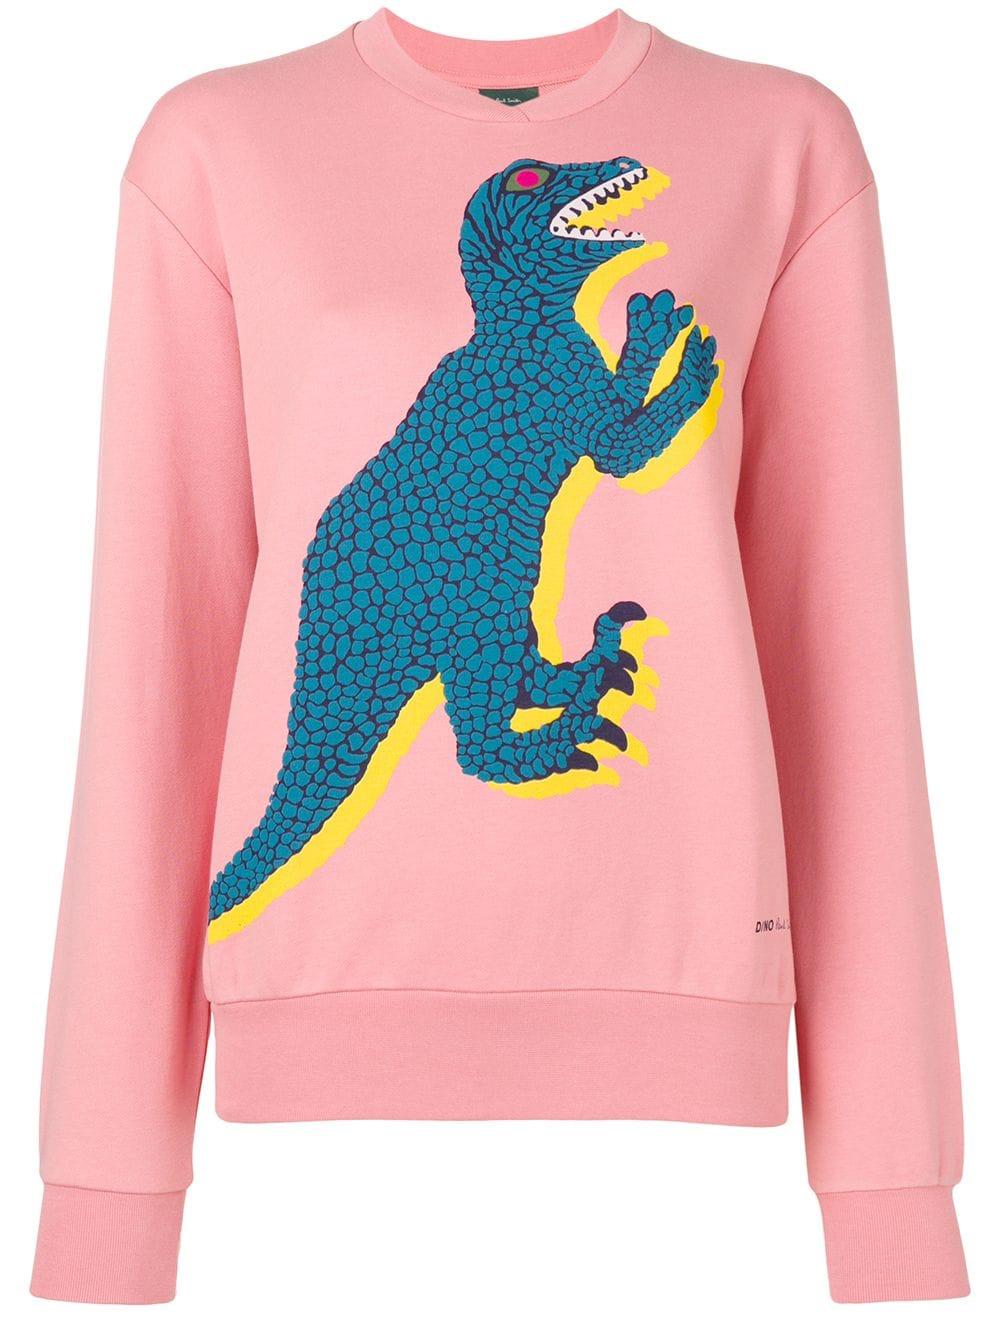 Ps By Paul Smith dinosaur sweatshirt Pink | Sweatshirts